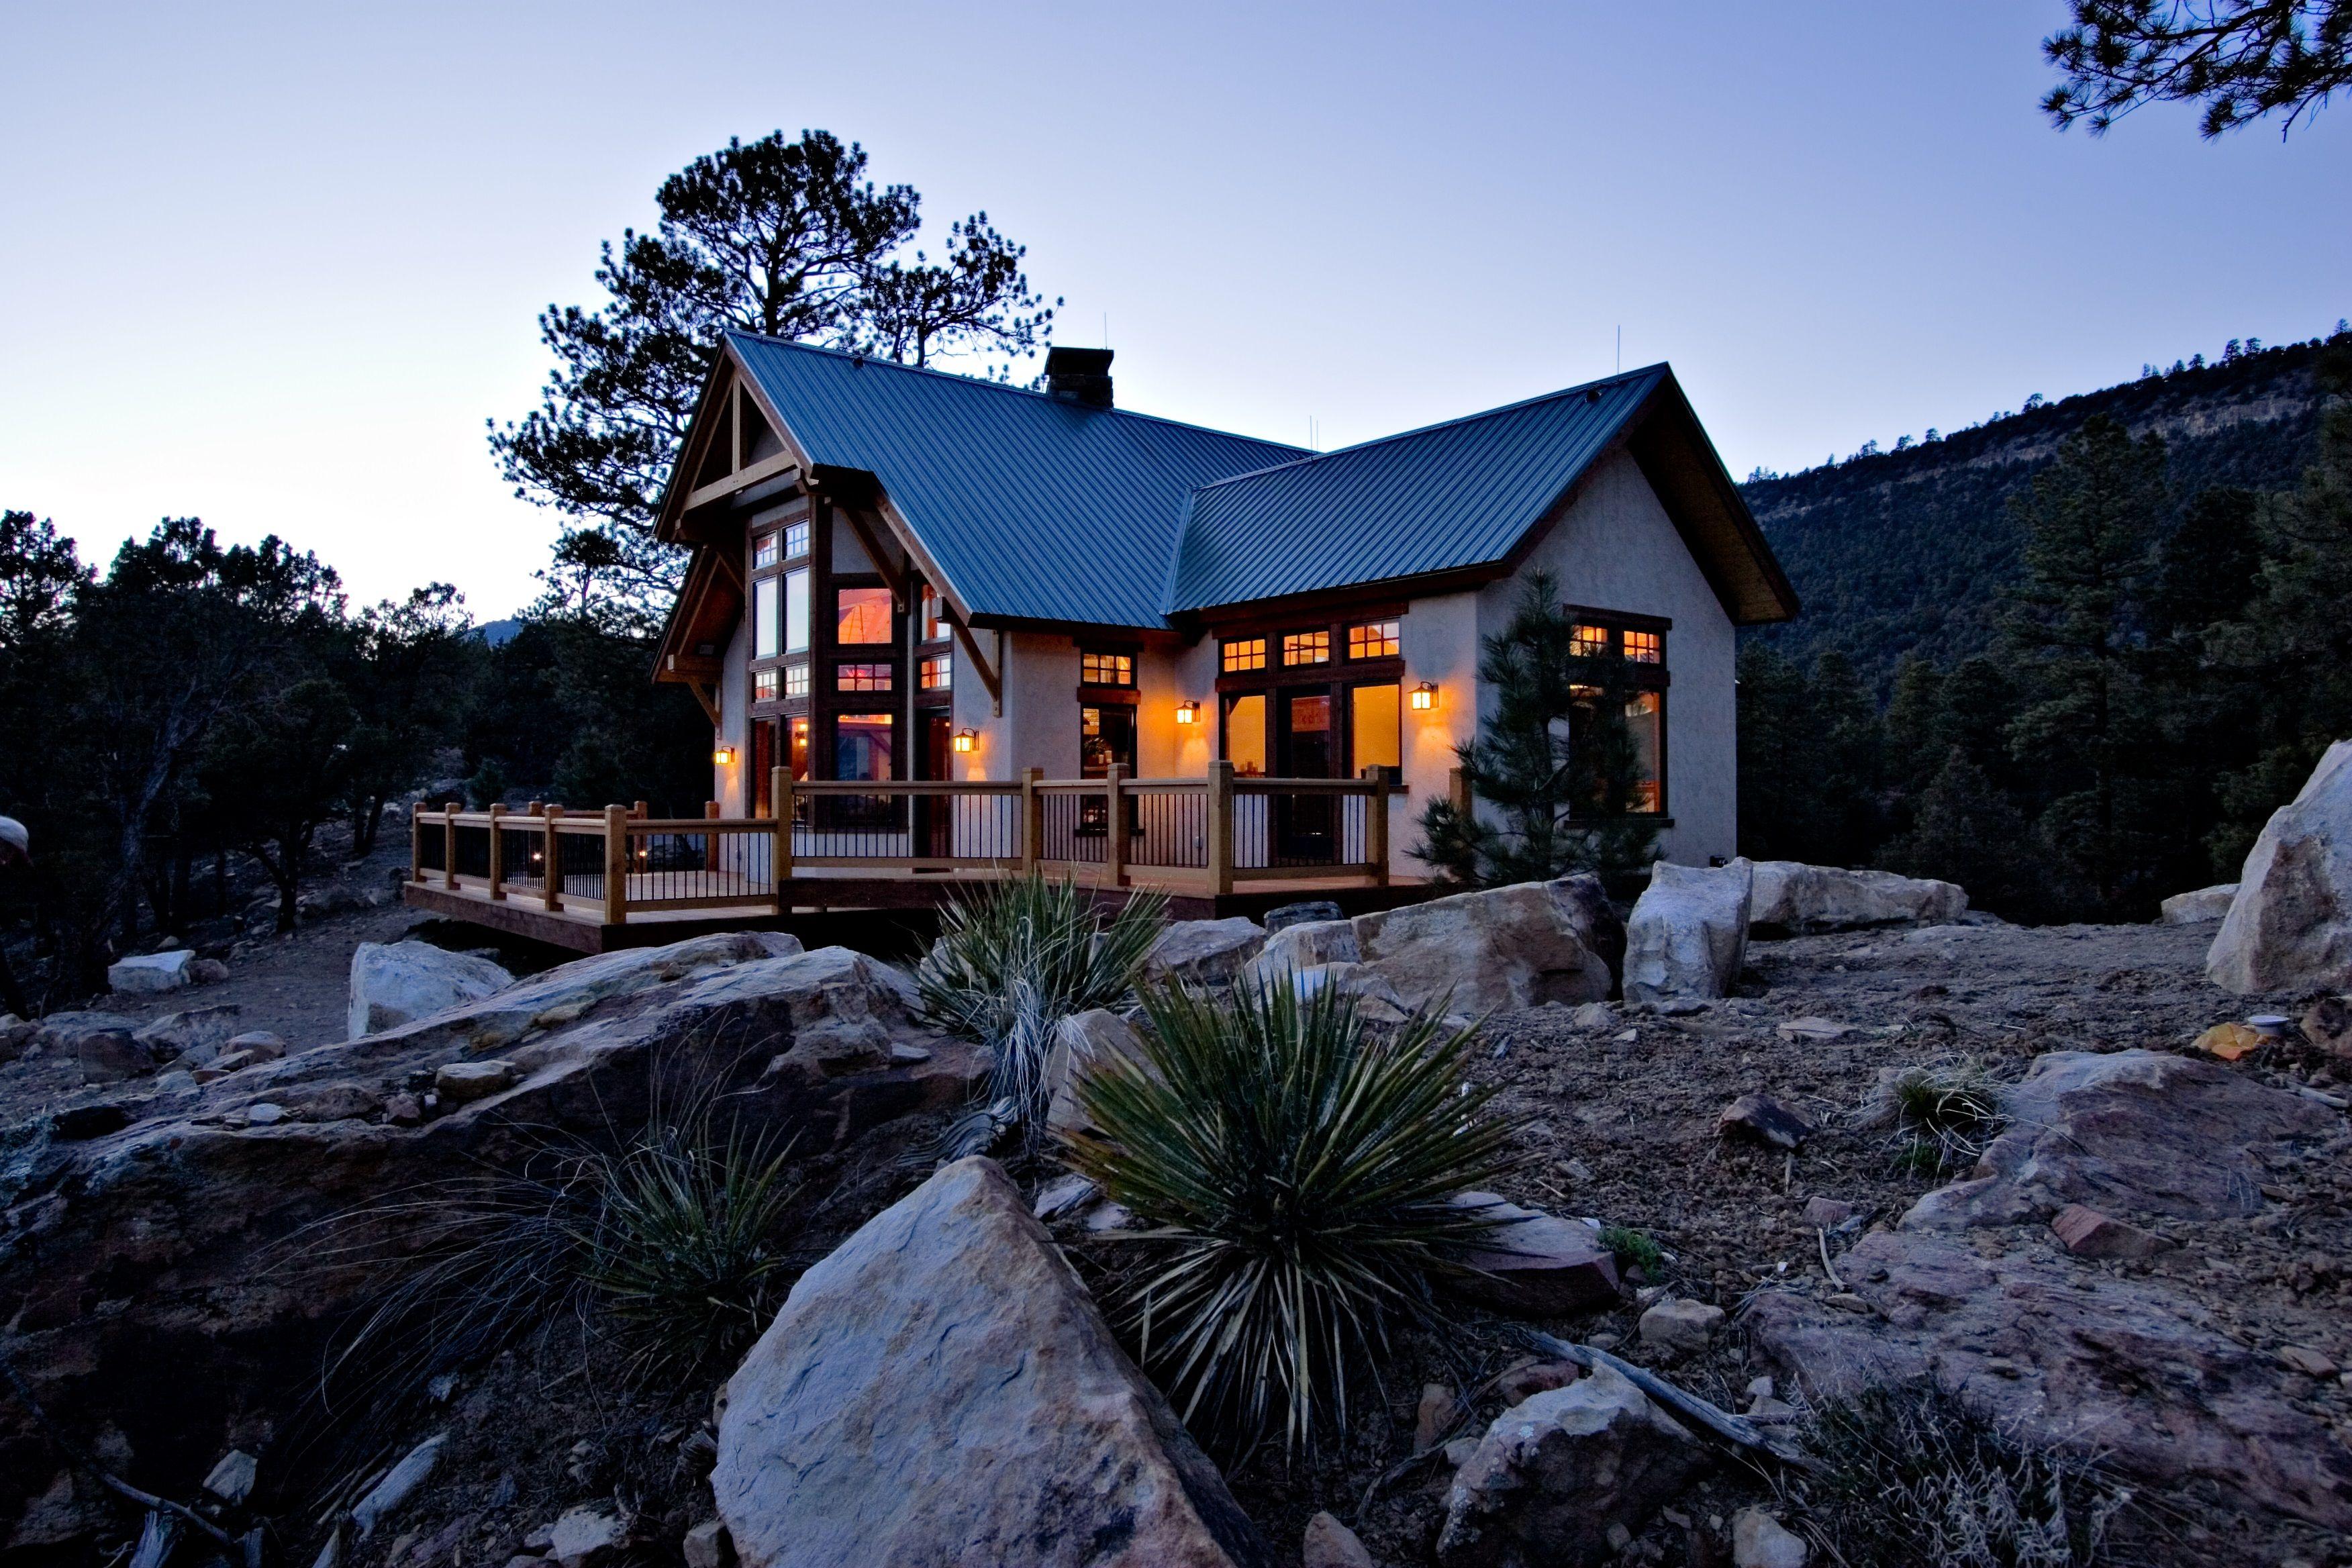 Colorado timber frame home | Bensonwood Gallery | Pinterest